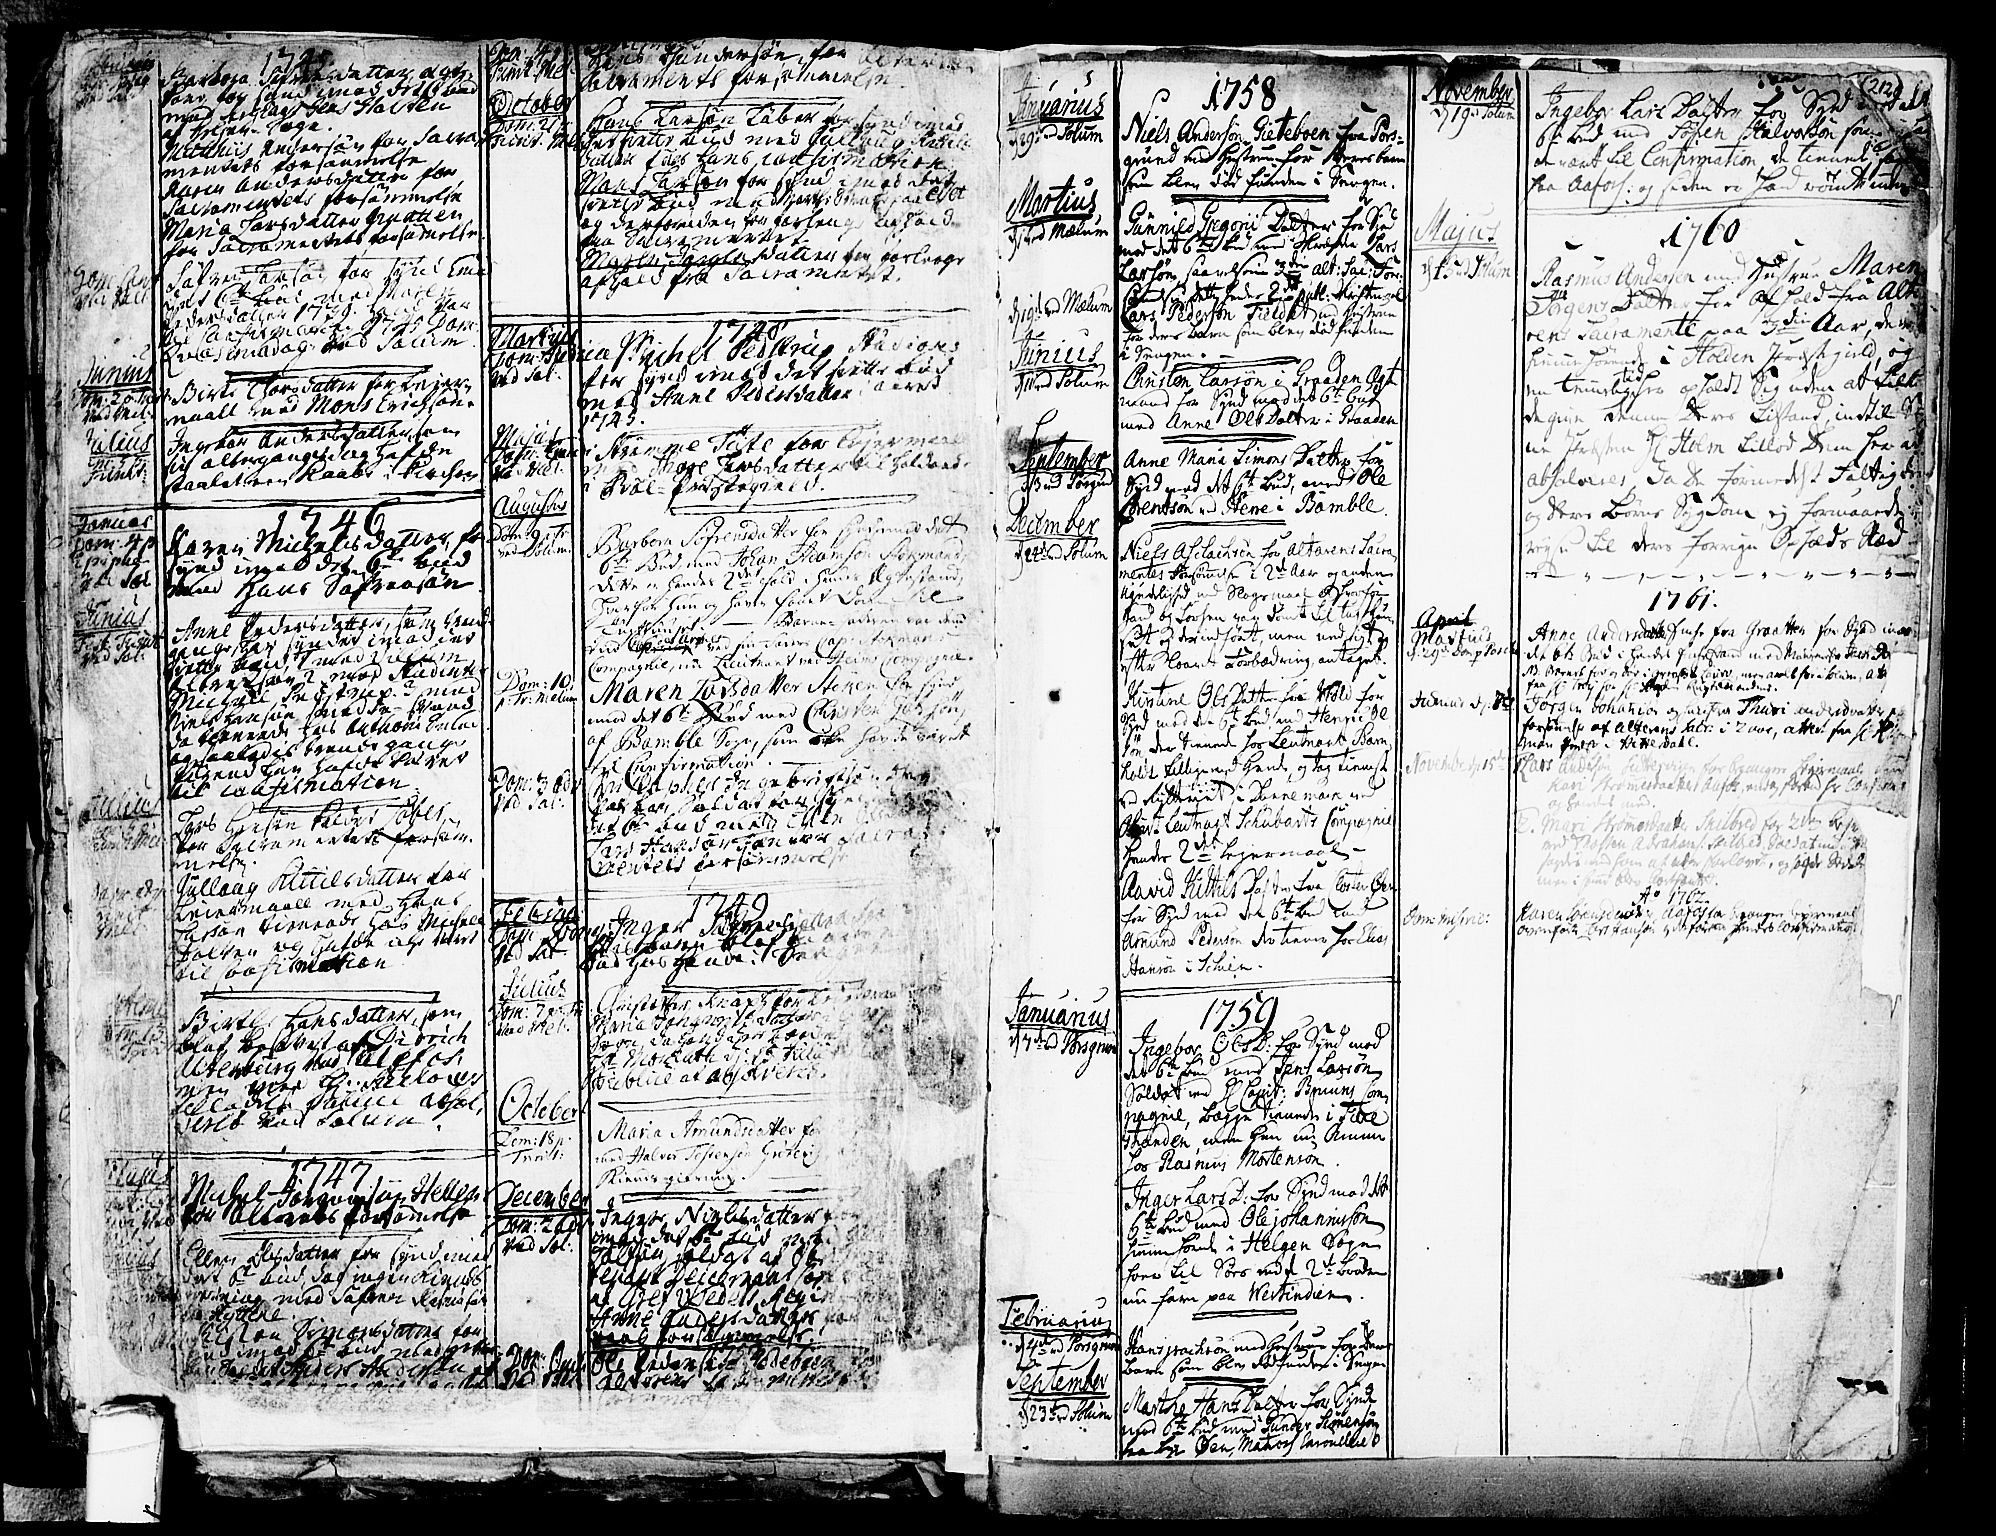 SAKO, Solum kirkebøker, F/Fa/L0002: Ministerialbok nr. I 2, 1713-1761, s. 212